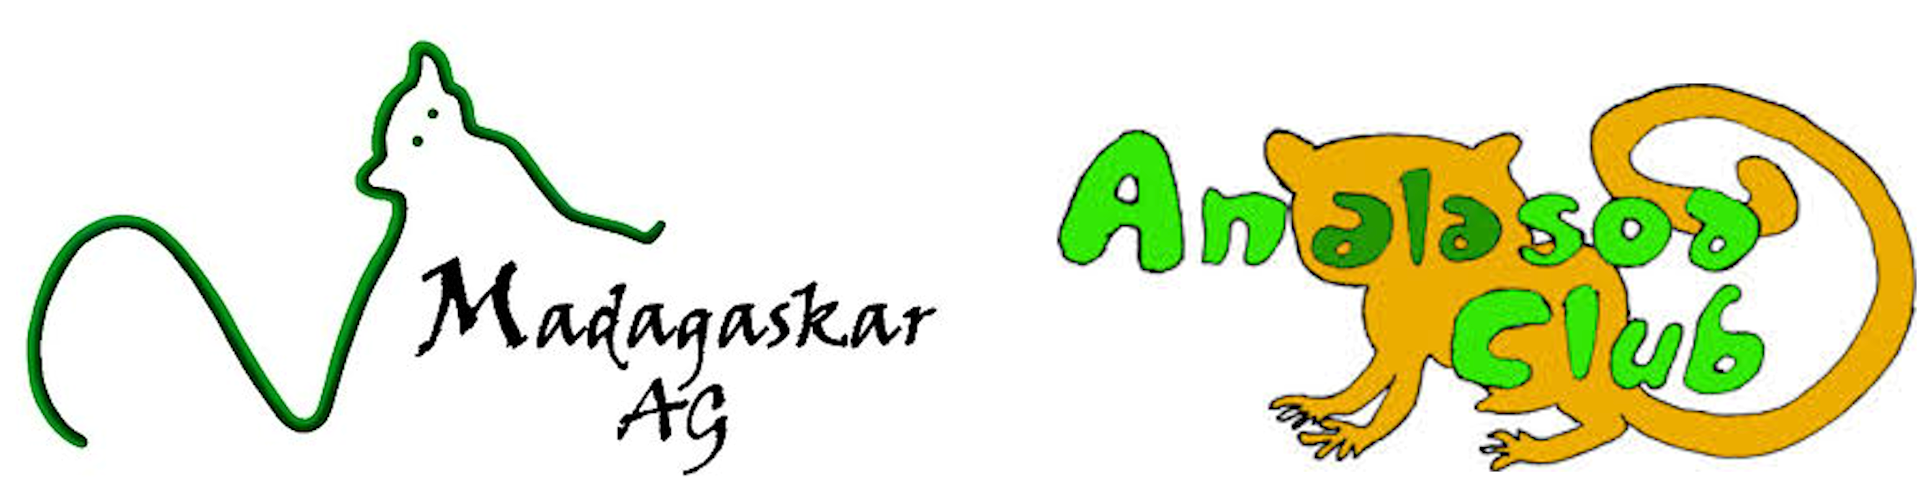 analasoa.org